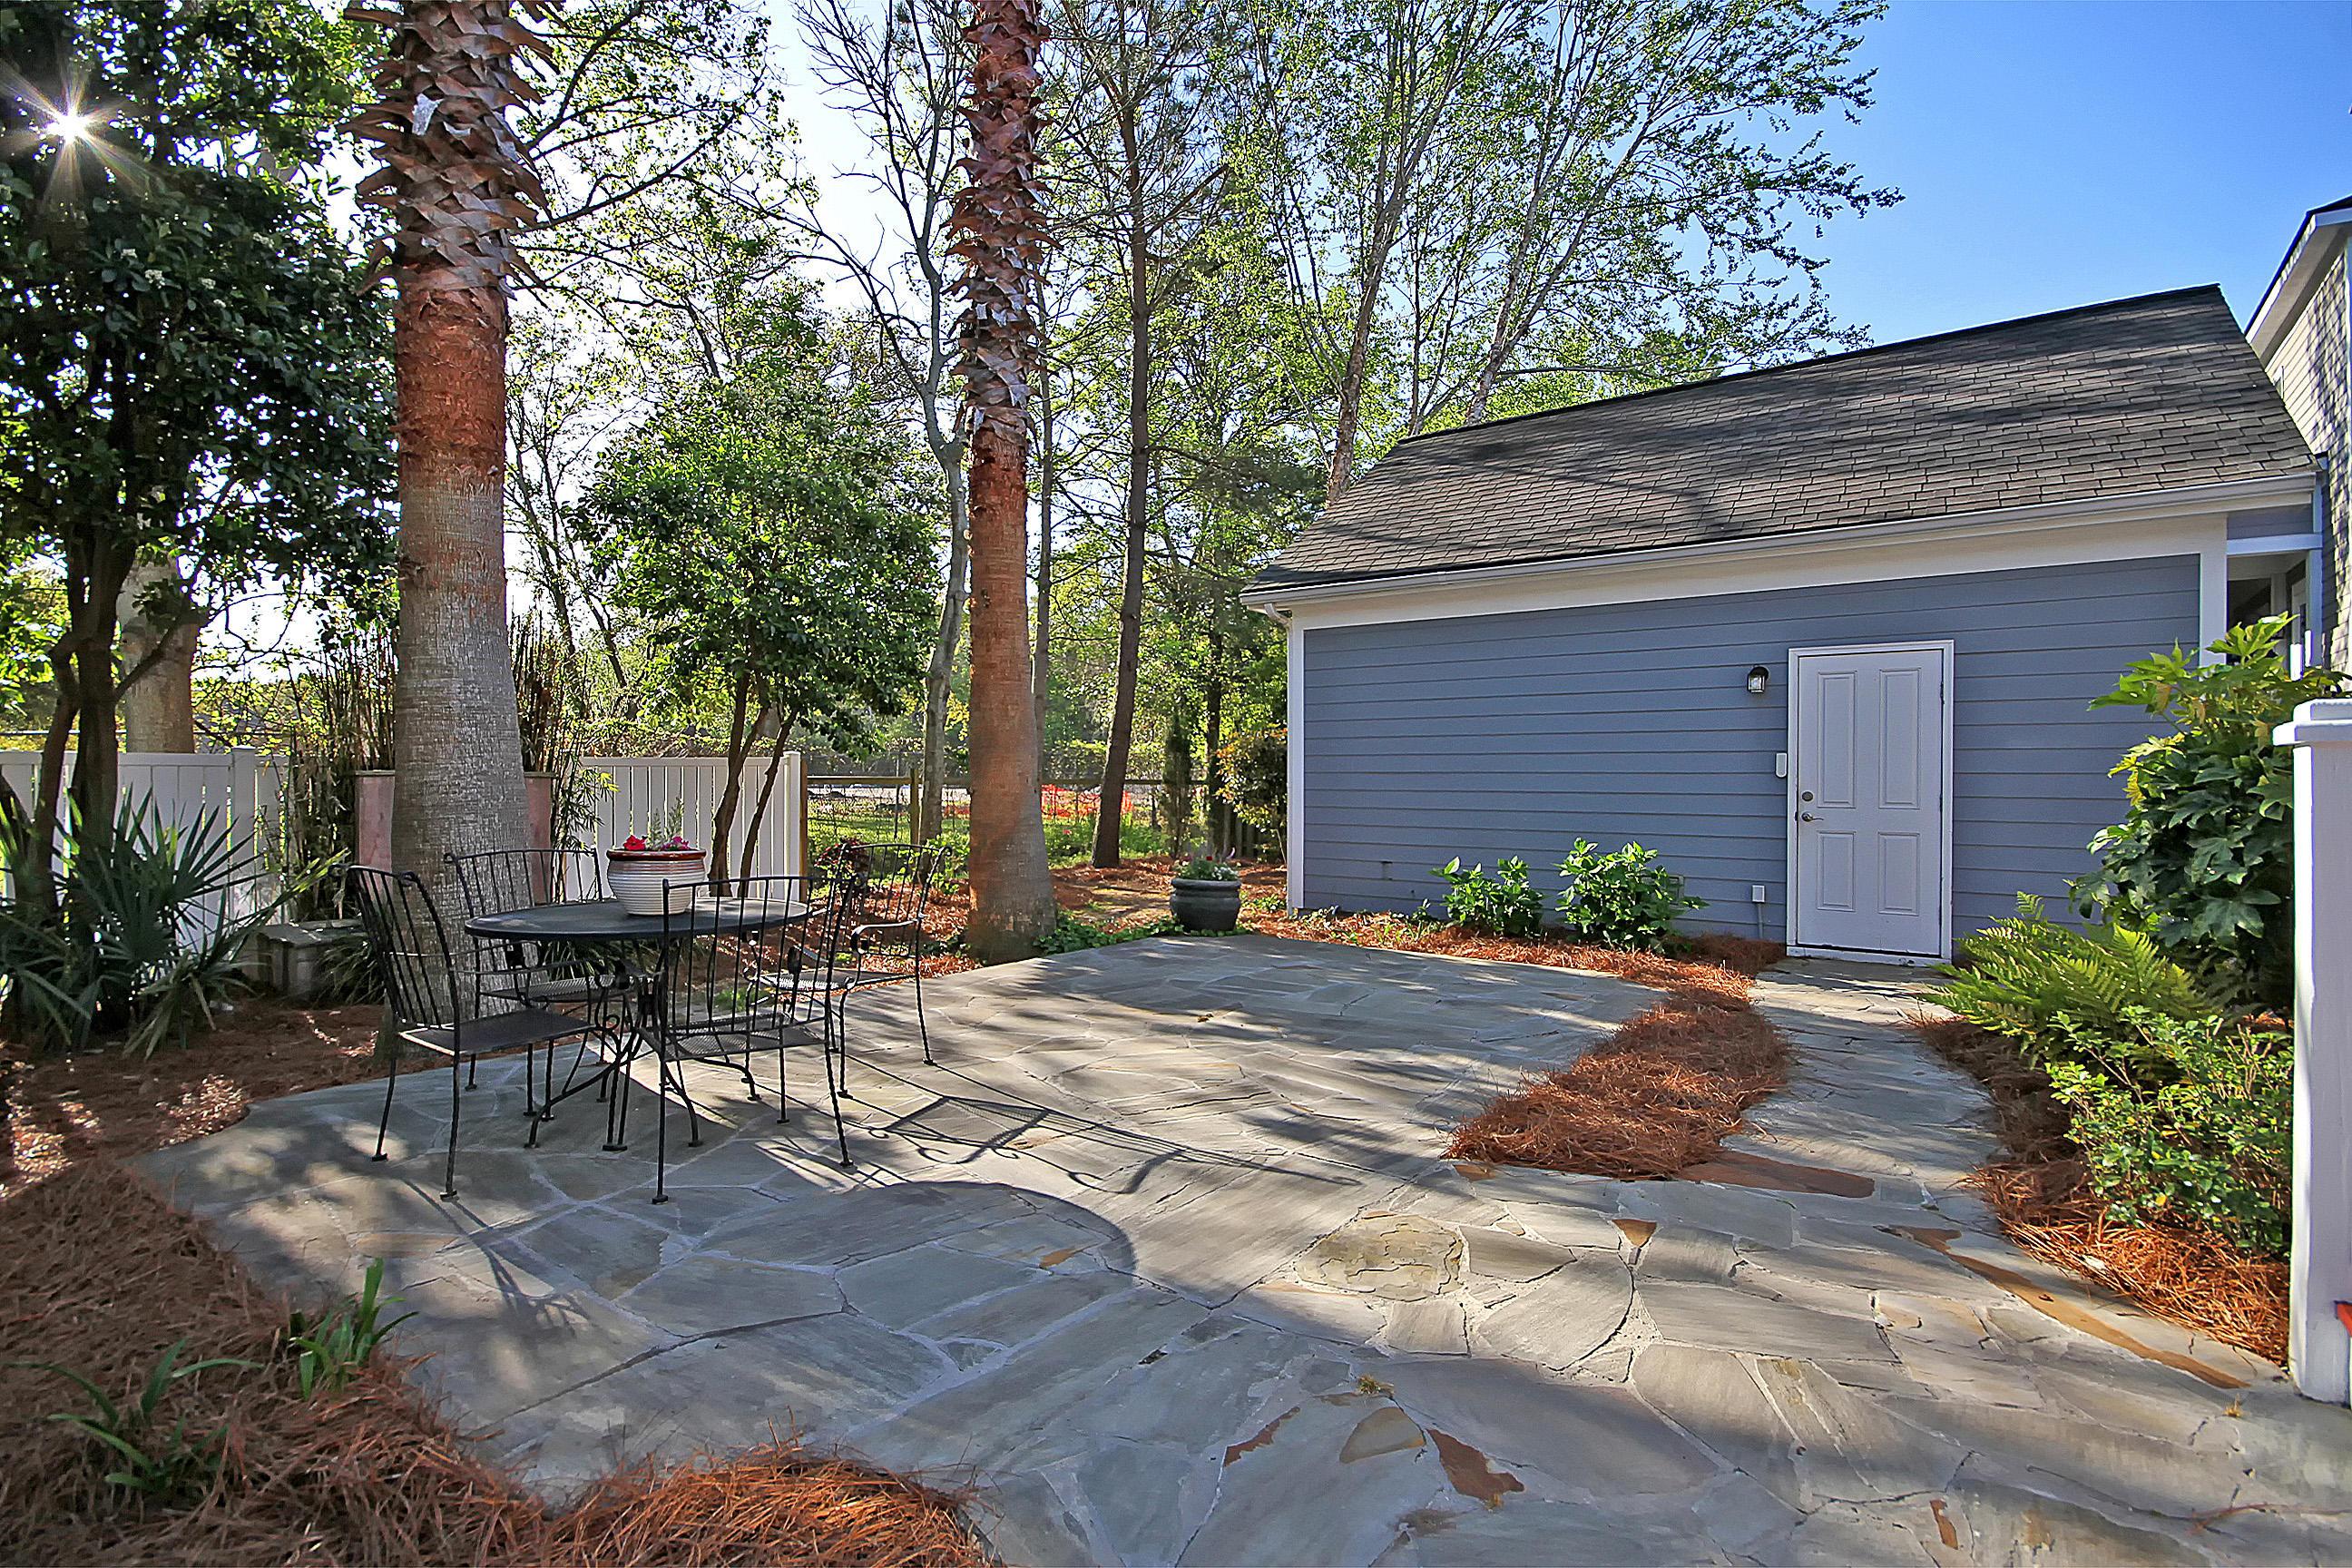 Cloudbreak Court Homes For Sale - 638 Cloudbreak, Charleston, SC - 30